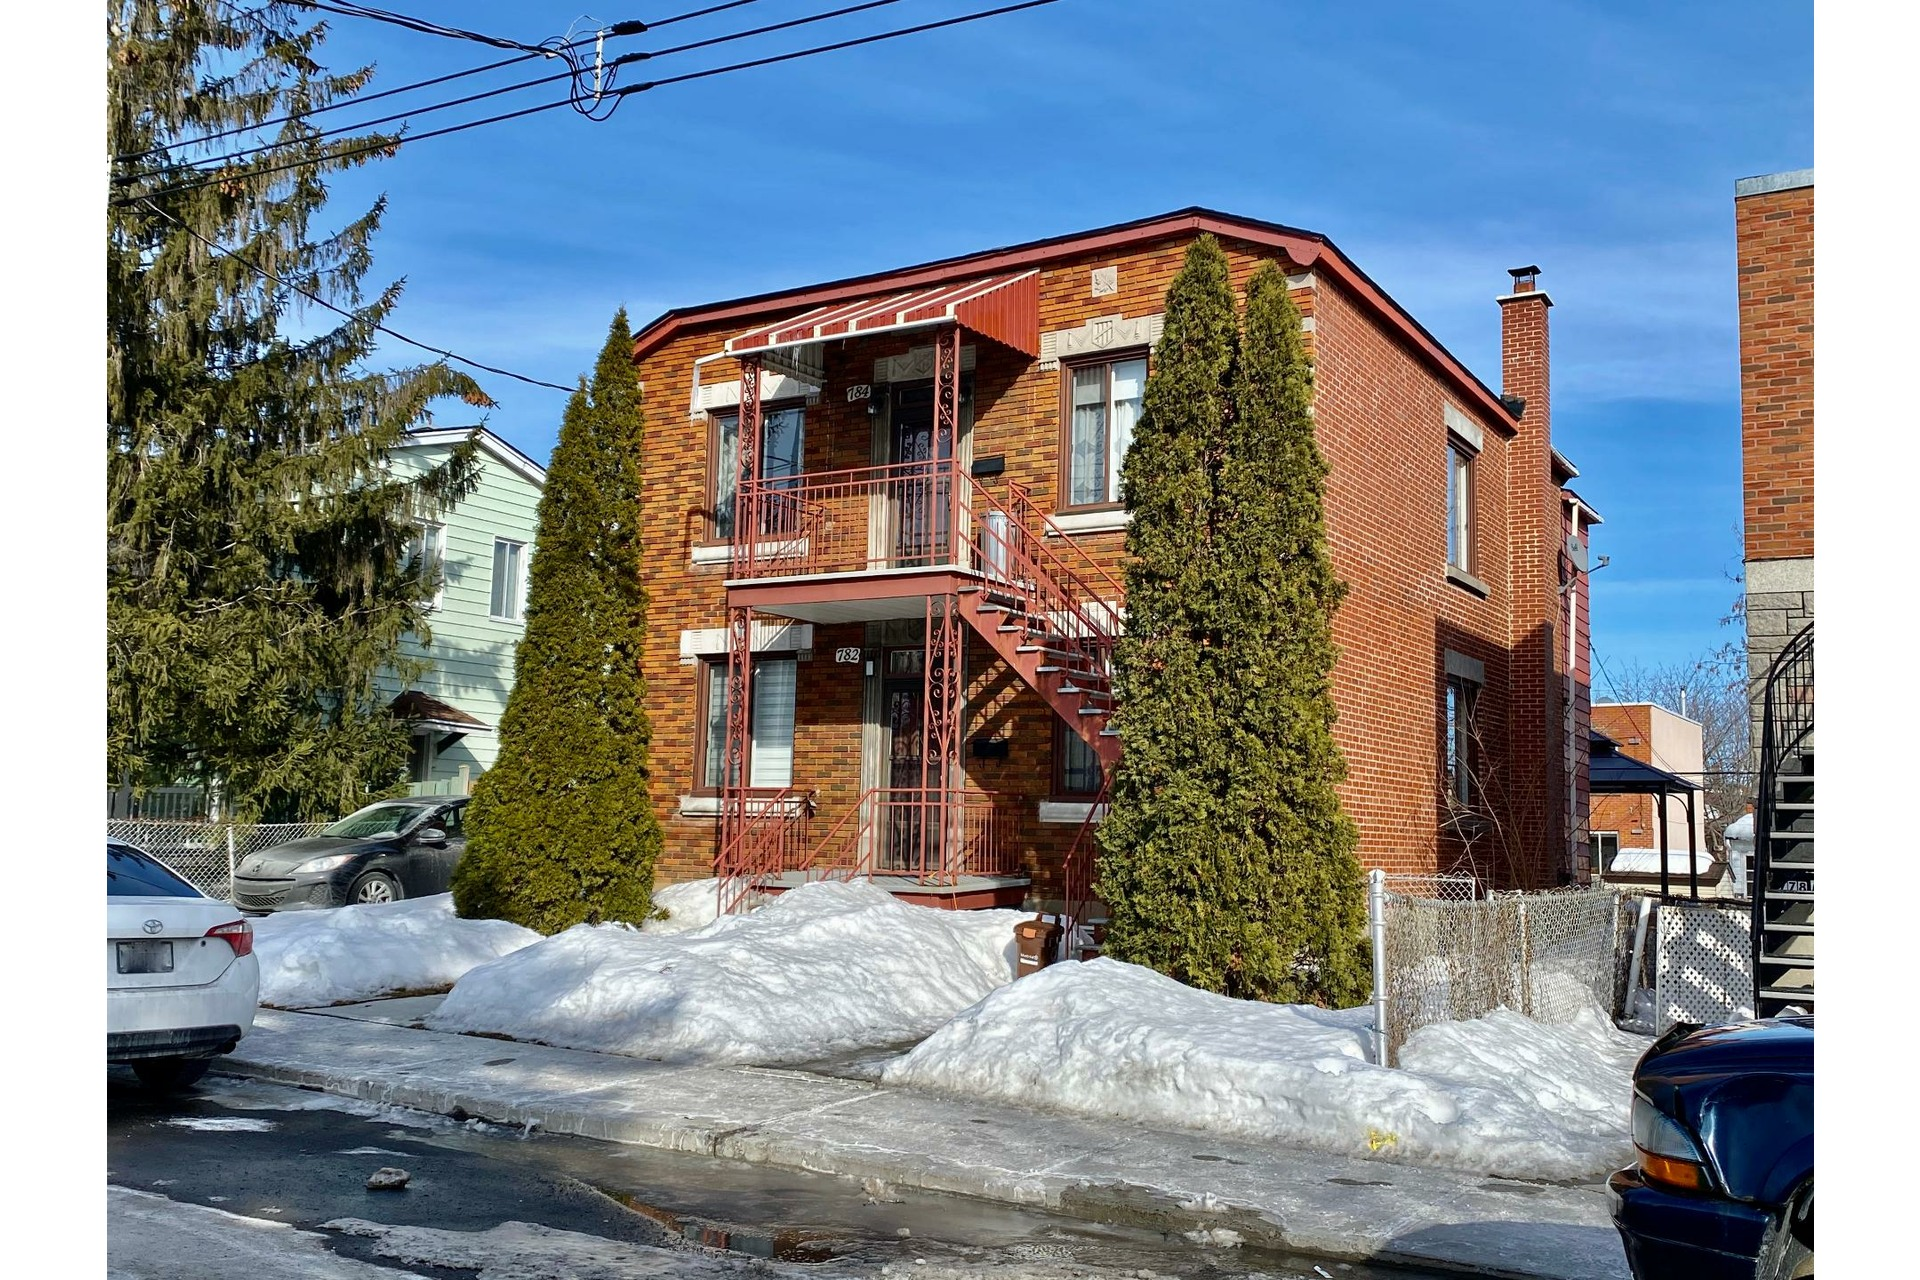 image 27 - Duplex En venta Lachine Montréal  - 6 habitaciones